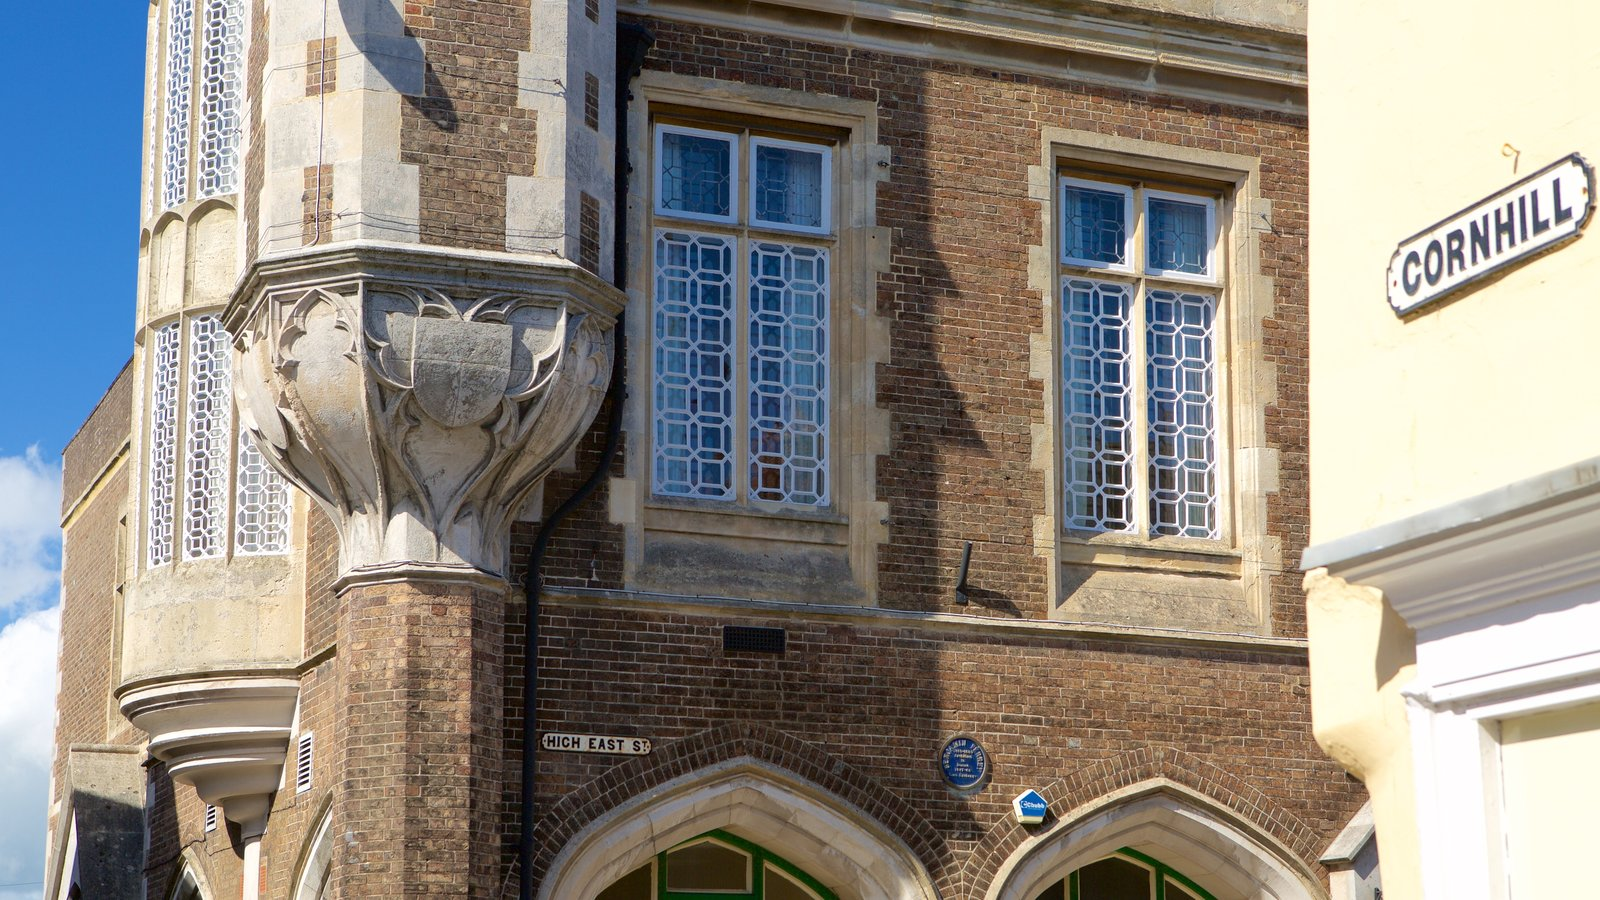 Dorchester showing heritage architecture